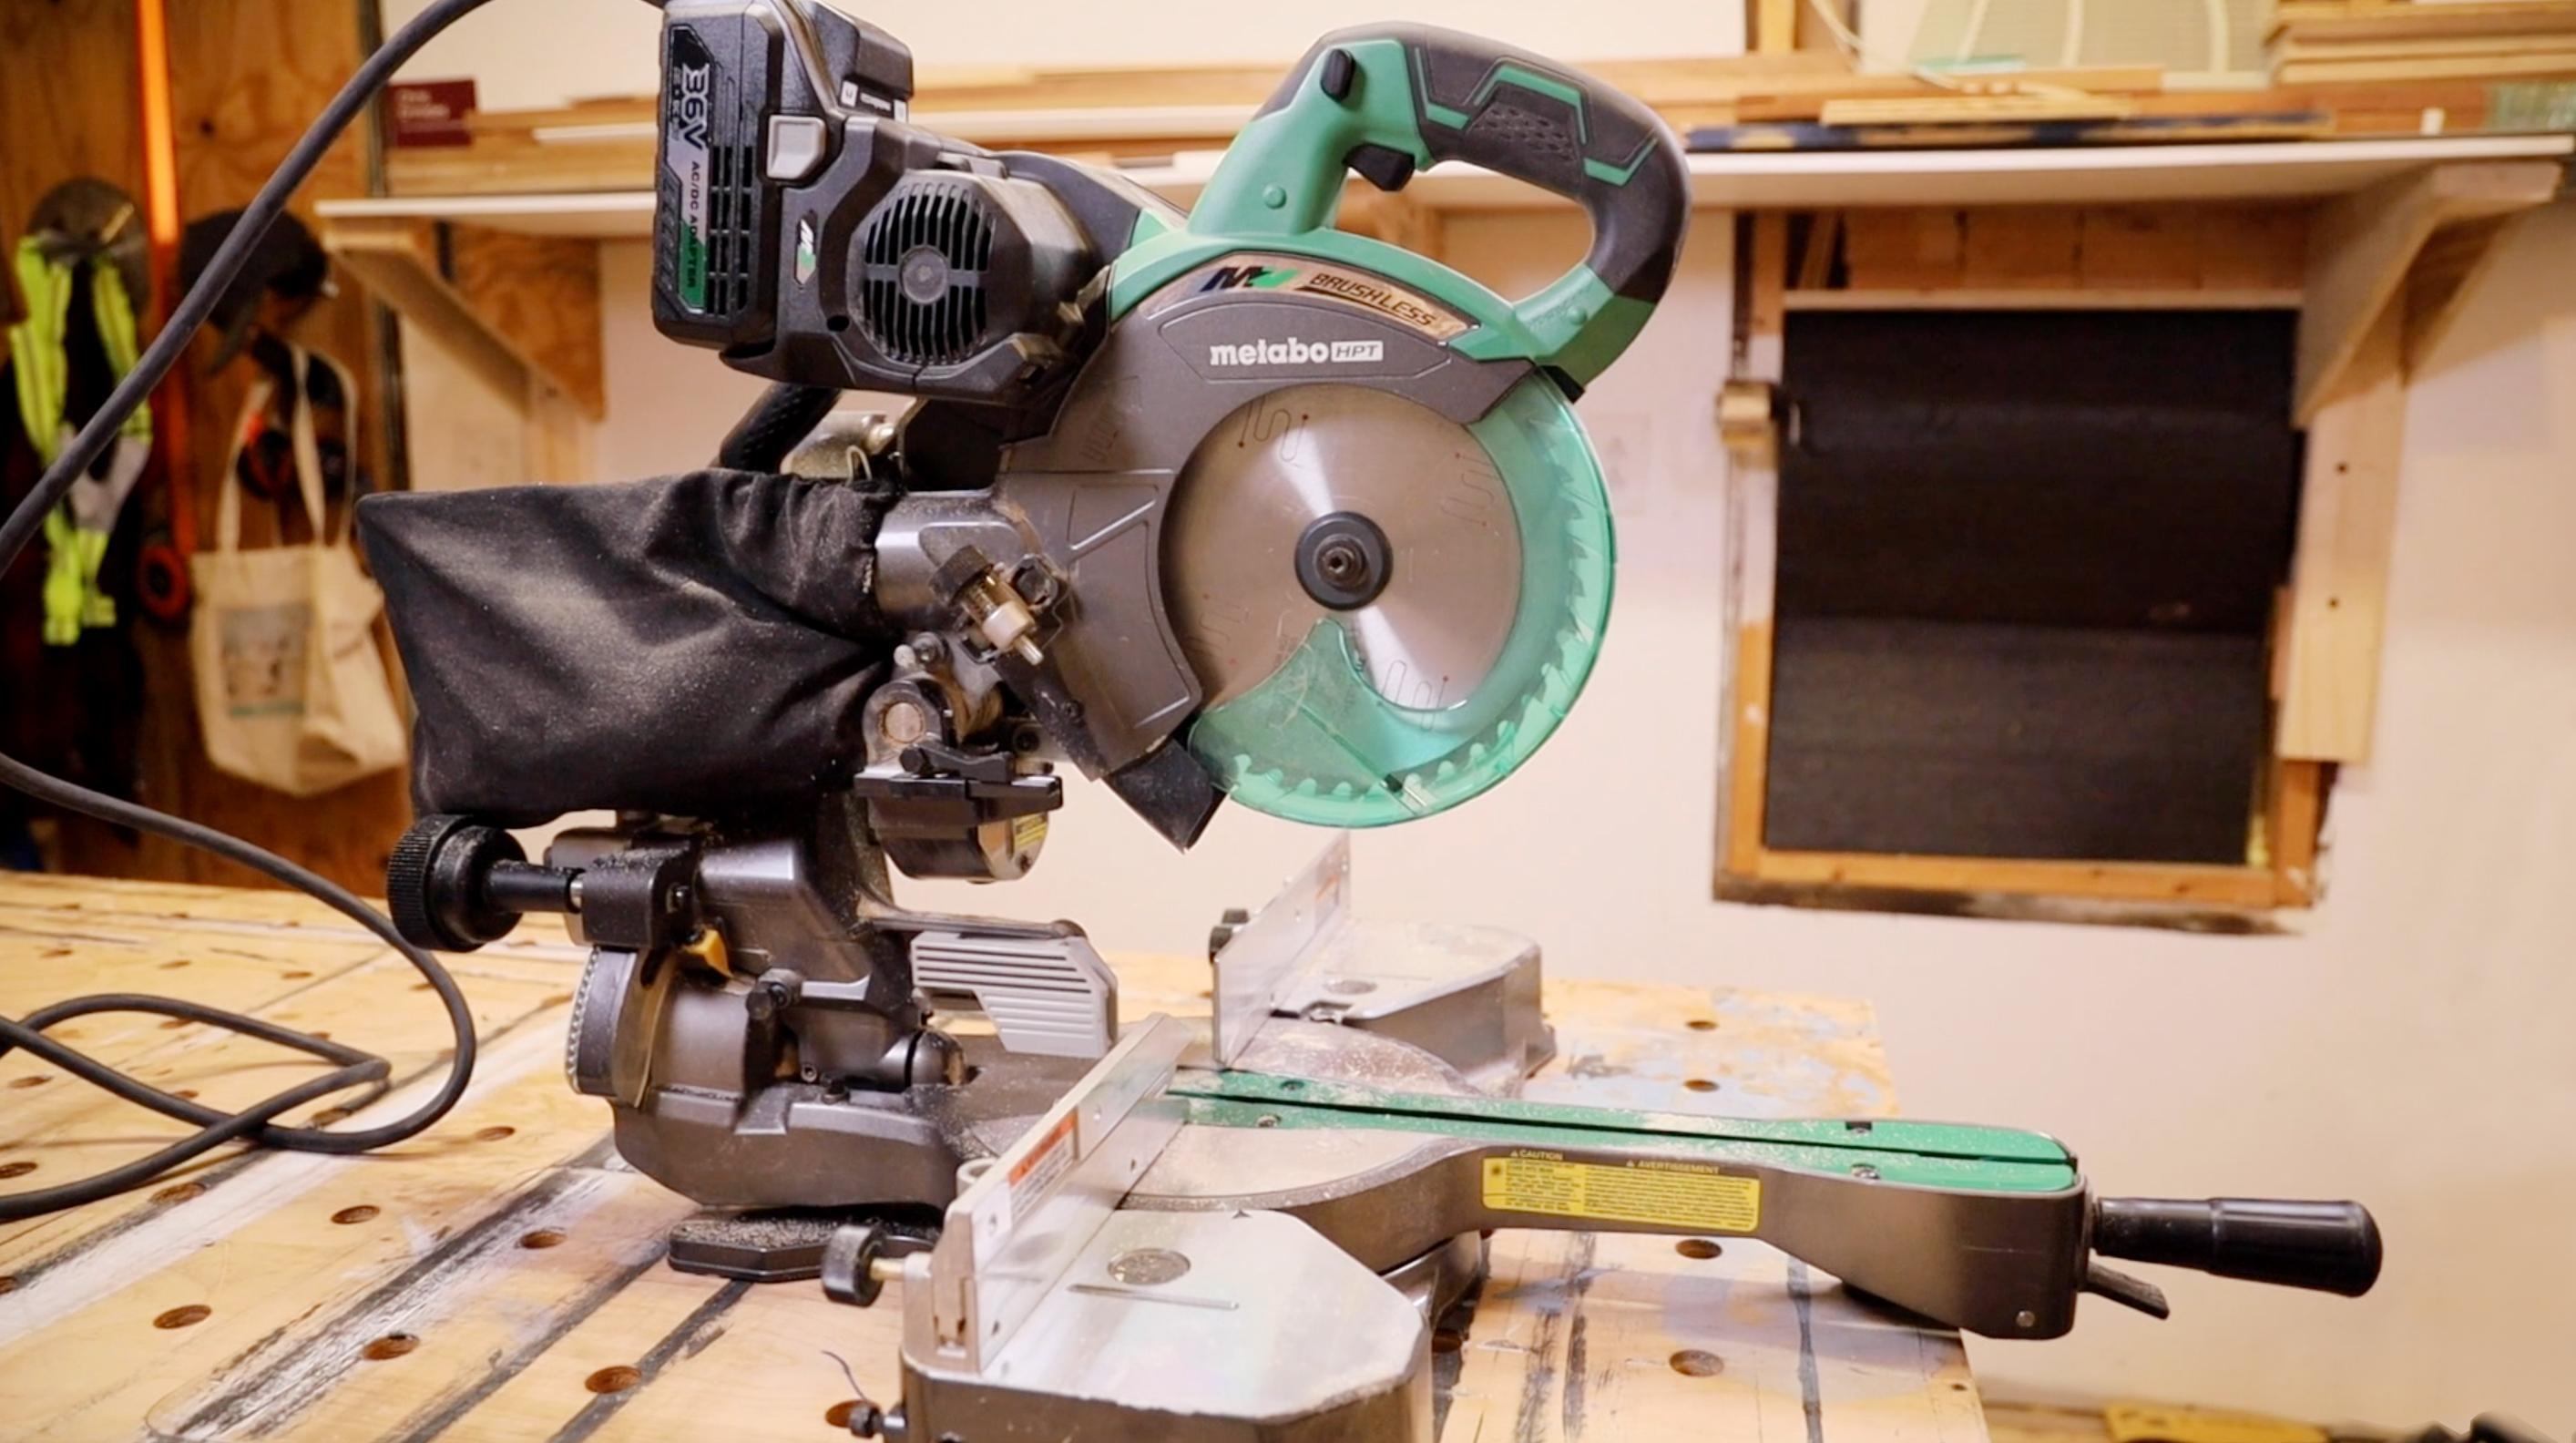 Tool Lab: Sliding Compound-Miter Saws, Spring 2021